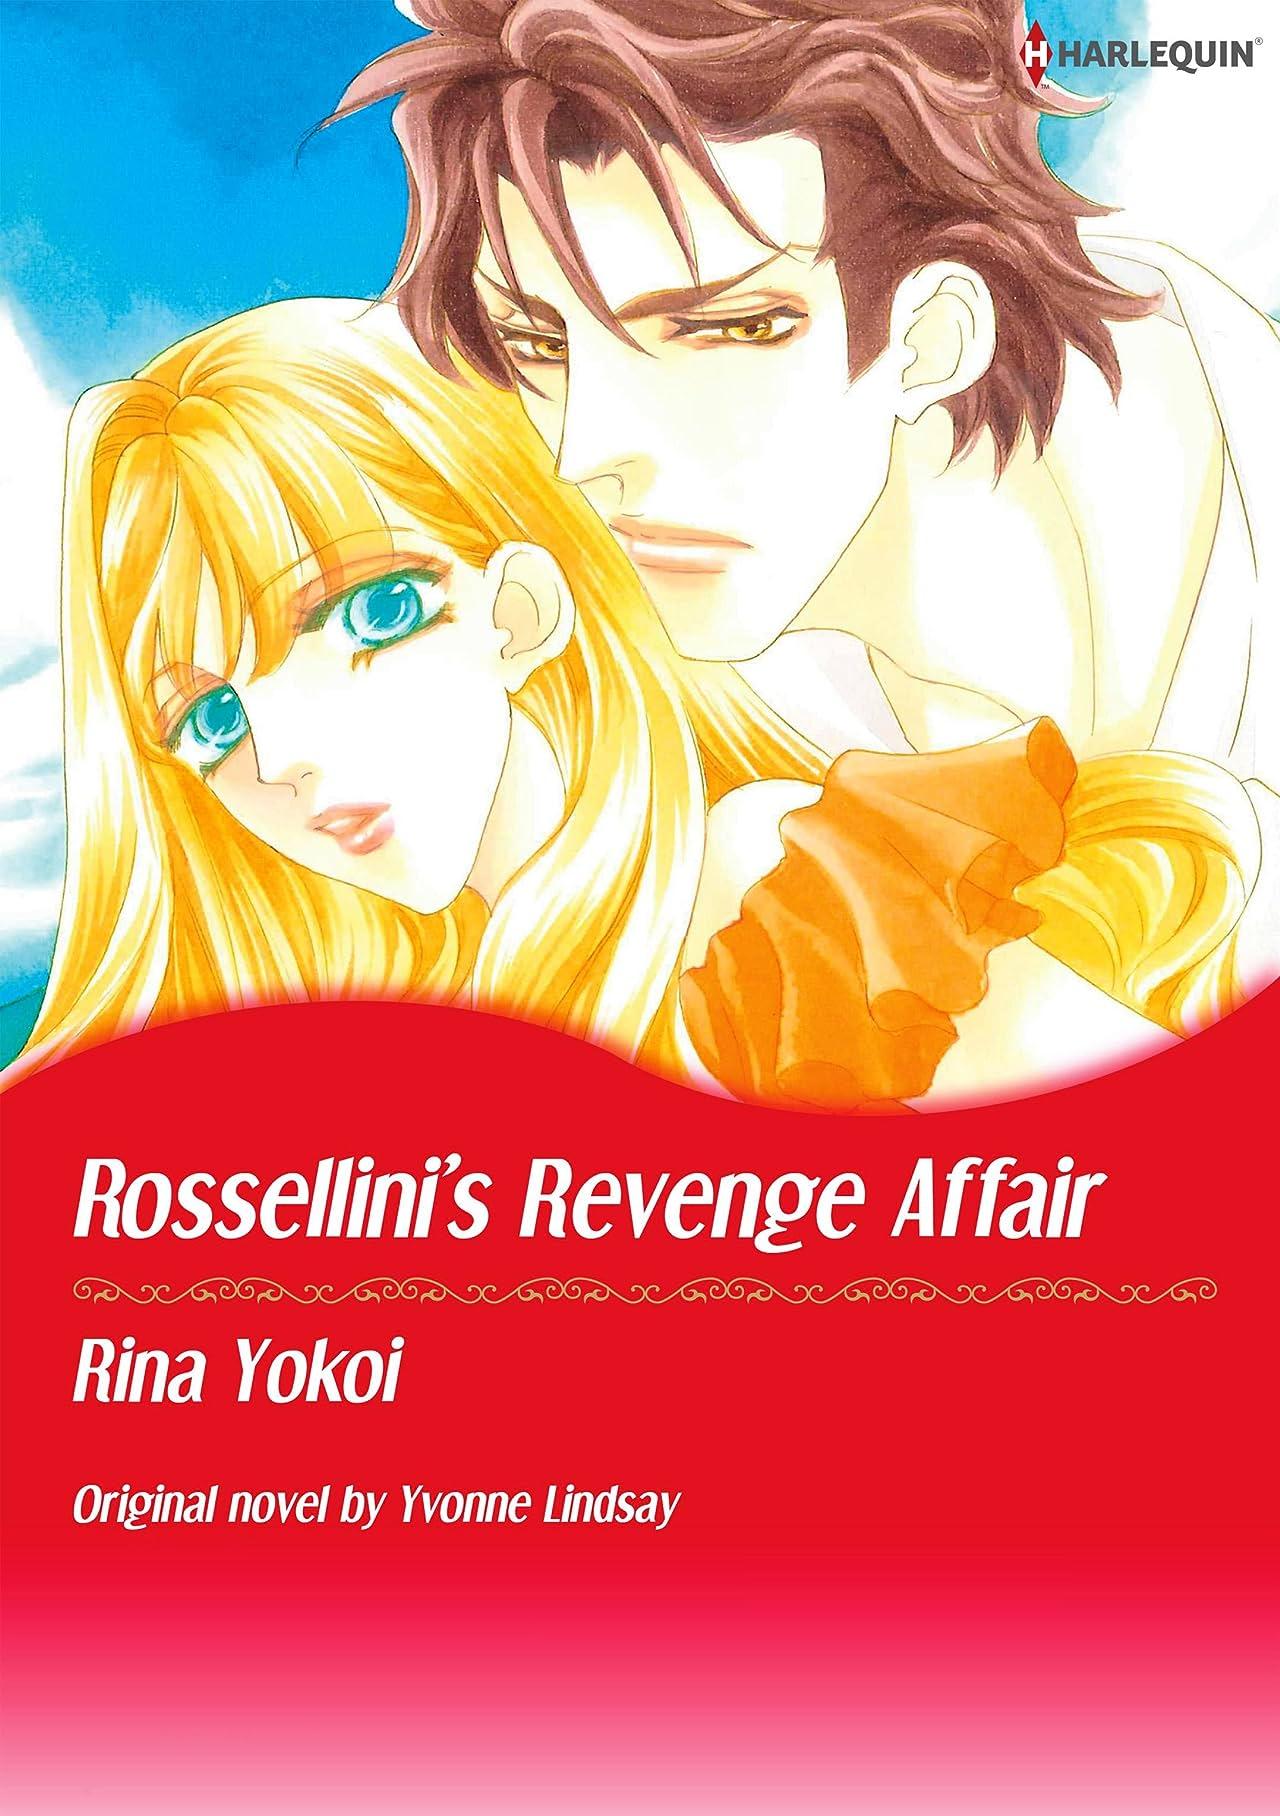 Rossellini's Revenge Affair